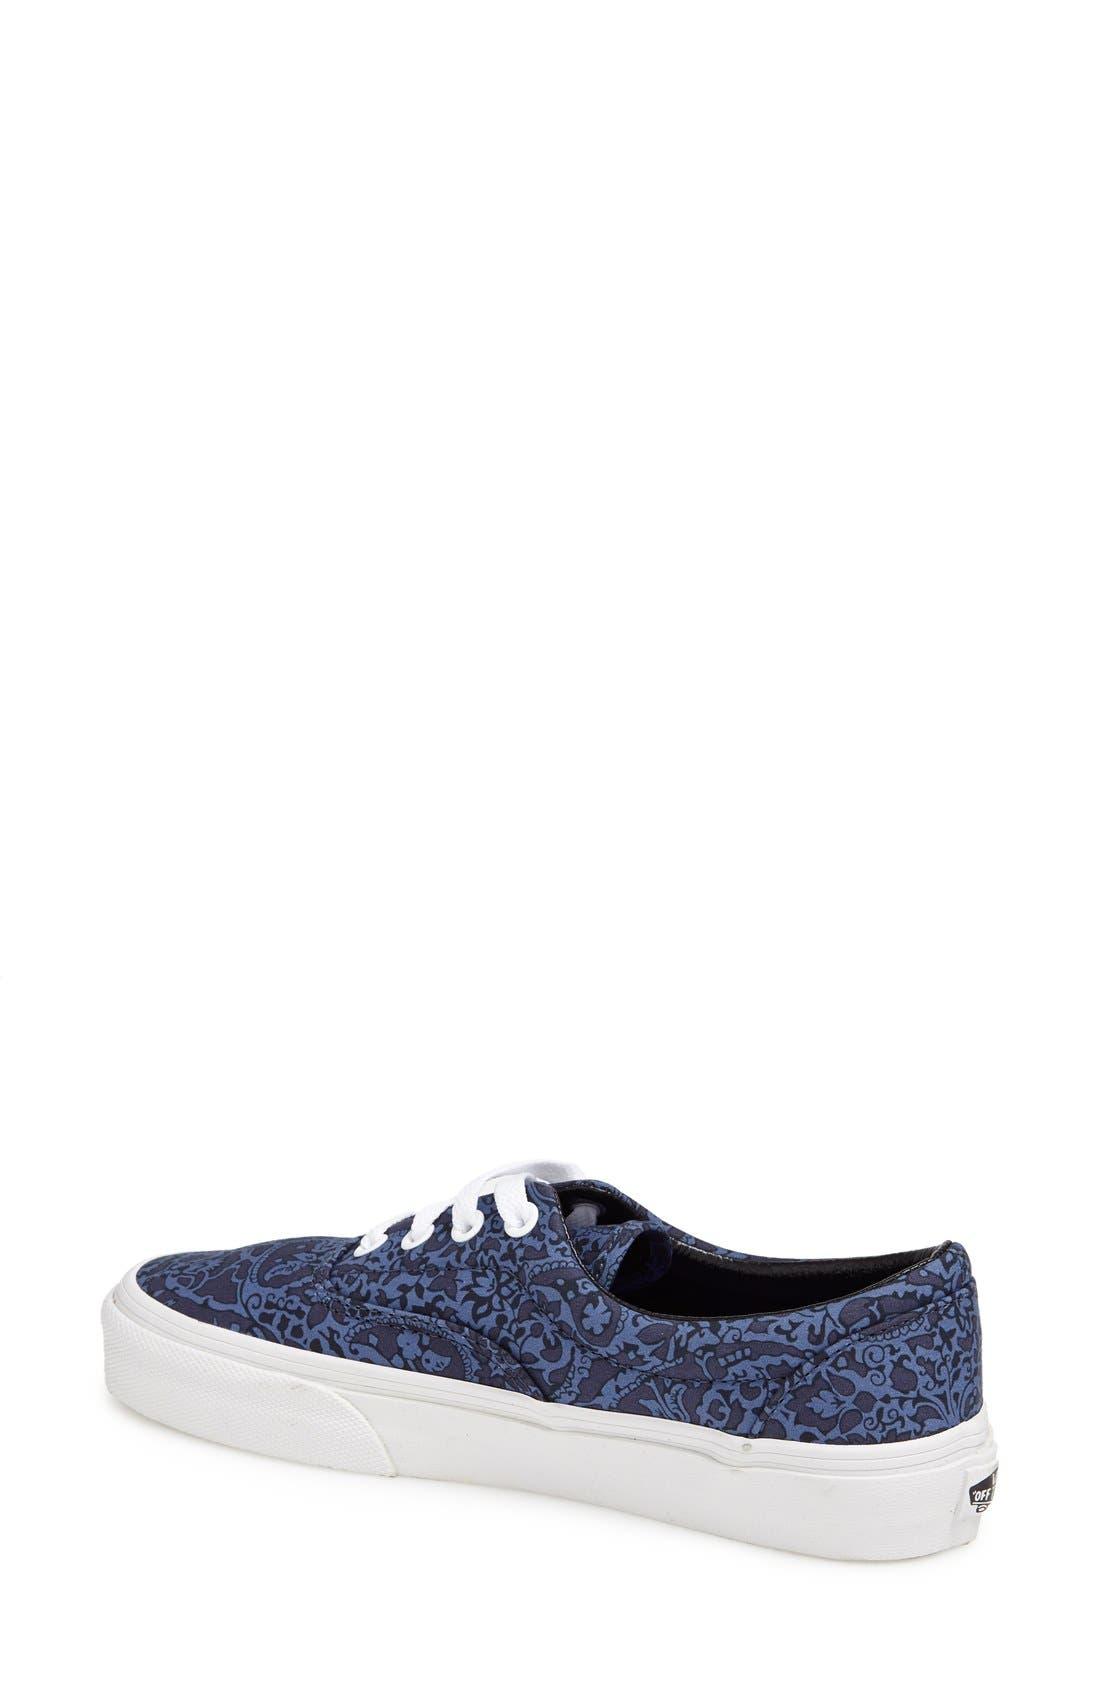 Alternate Image 2  - Vans 'Liberty Era' Sneaker (Women)